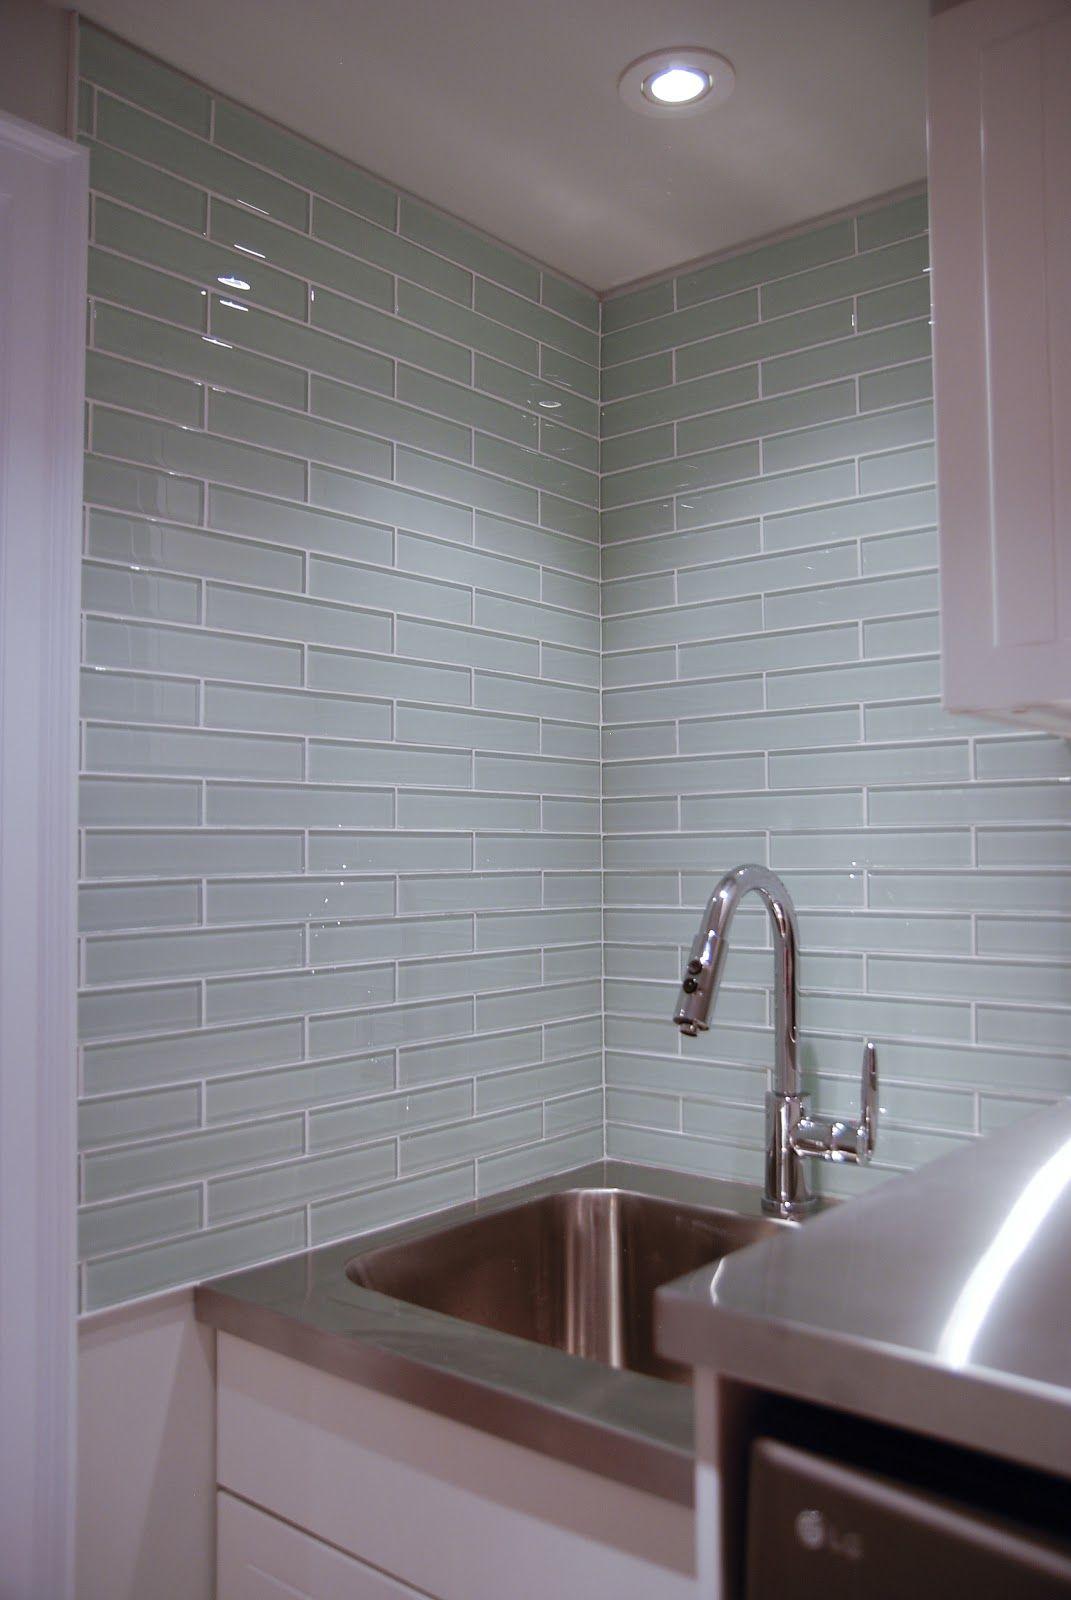 Kitchen backsplash http//centura.ca/residential/glass